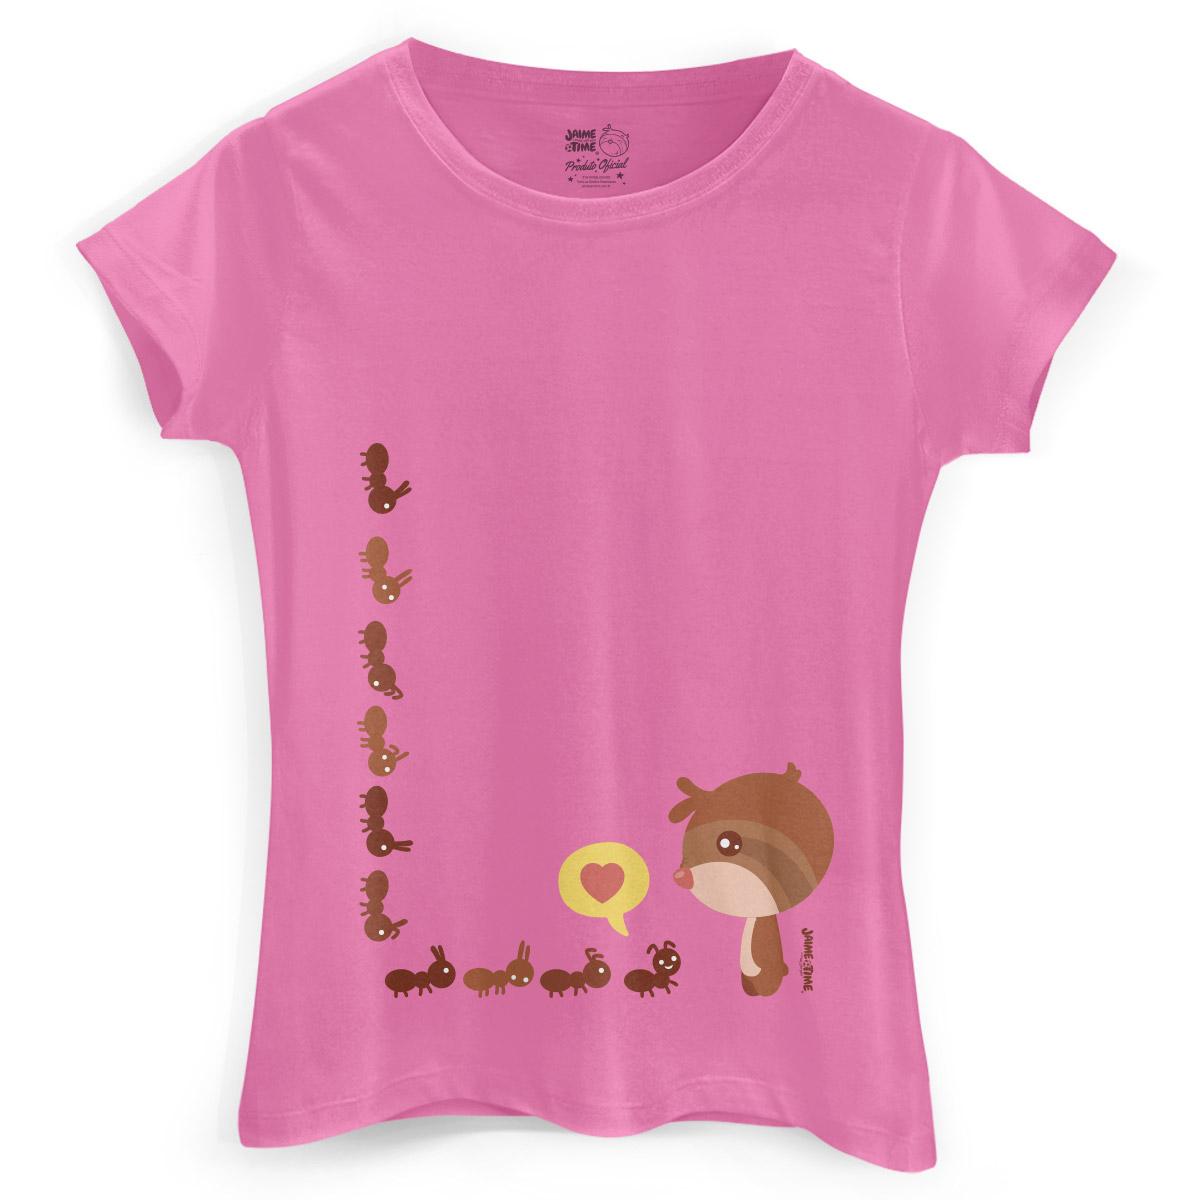 Camiseta Feminina Jaime Formigas